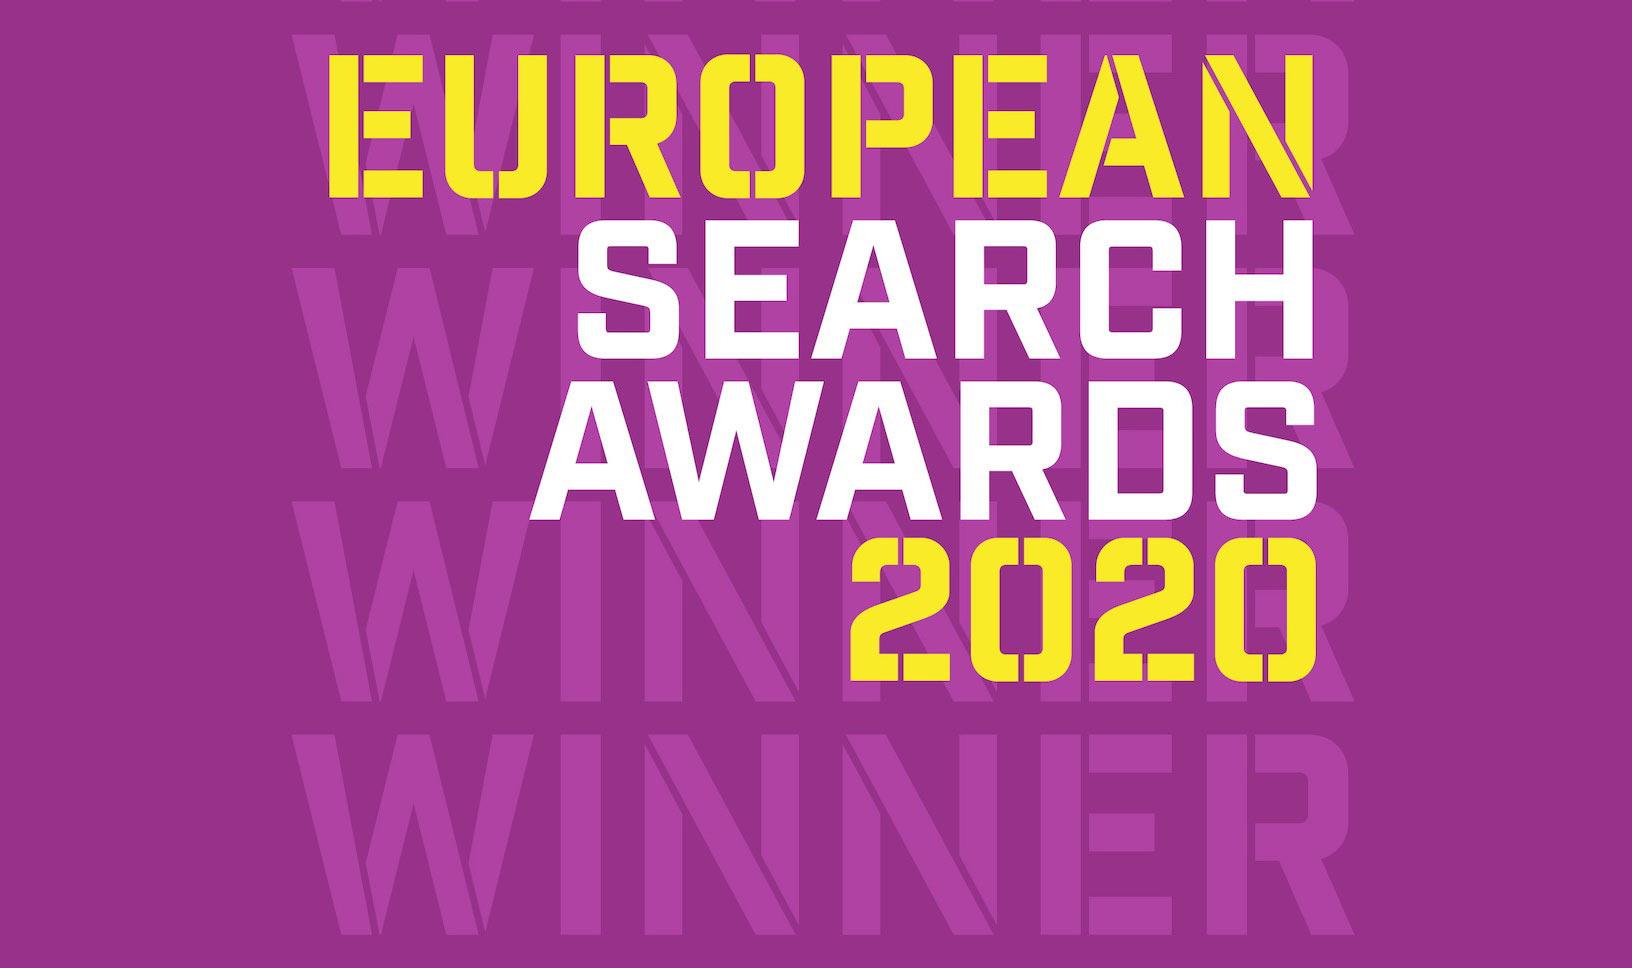 european search awards 2020 winner logo